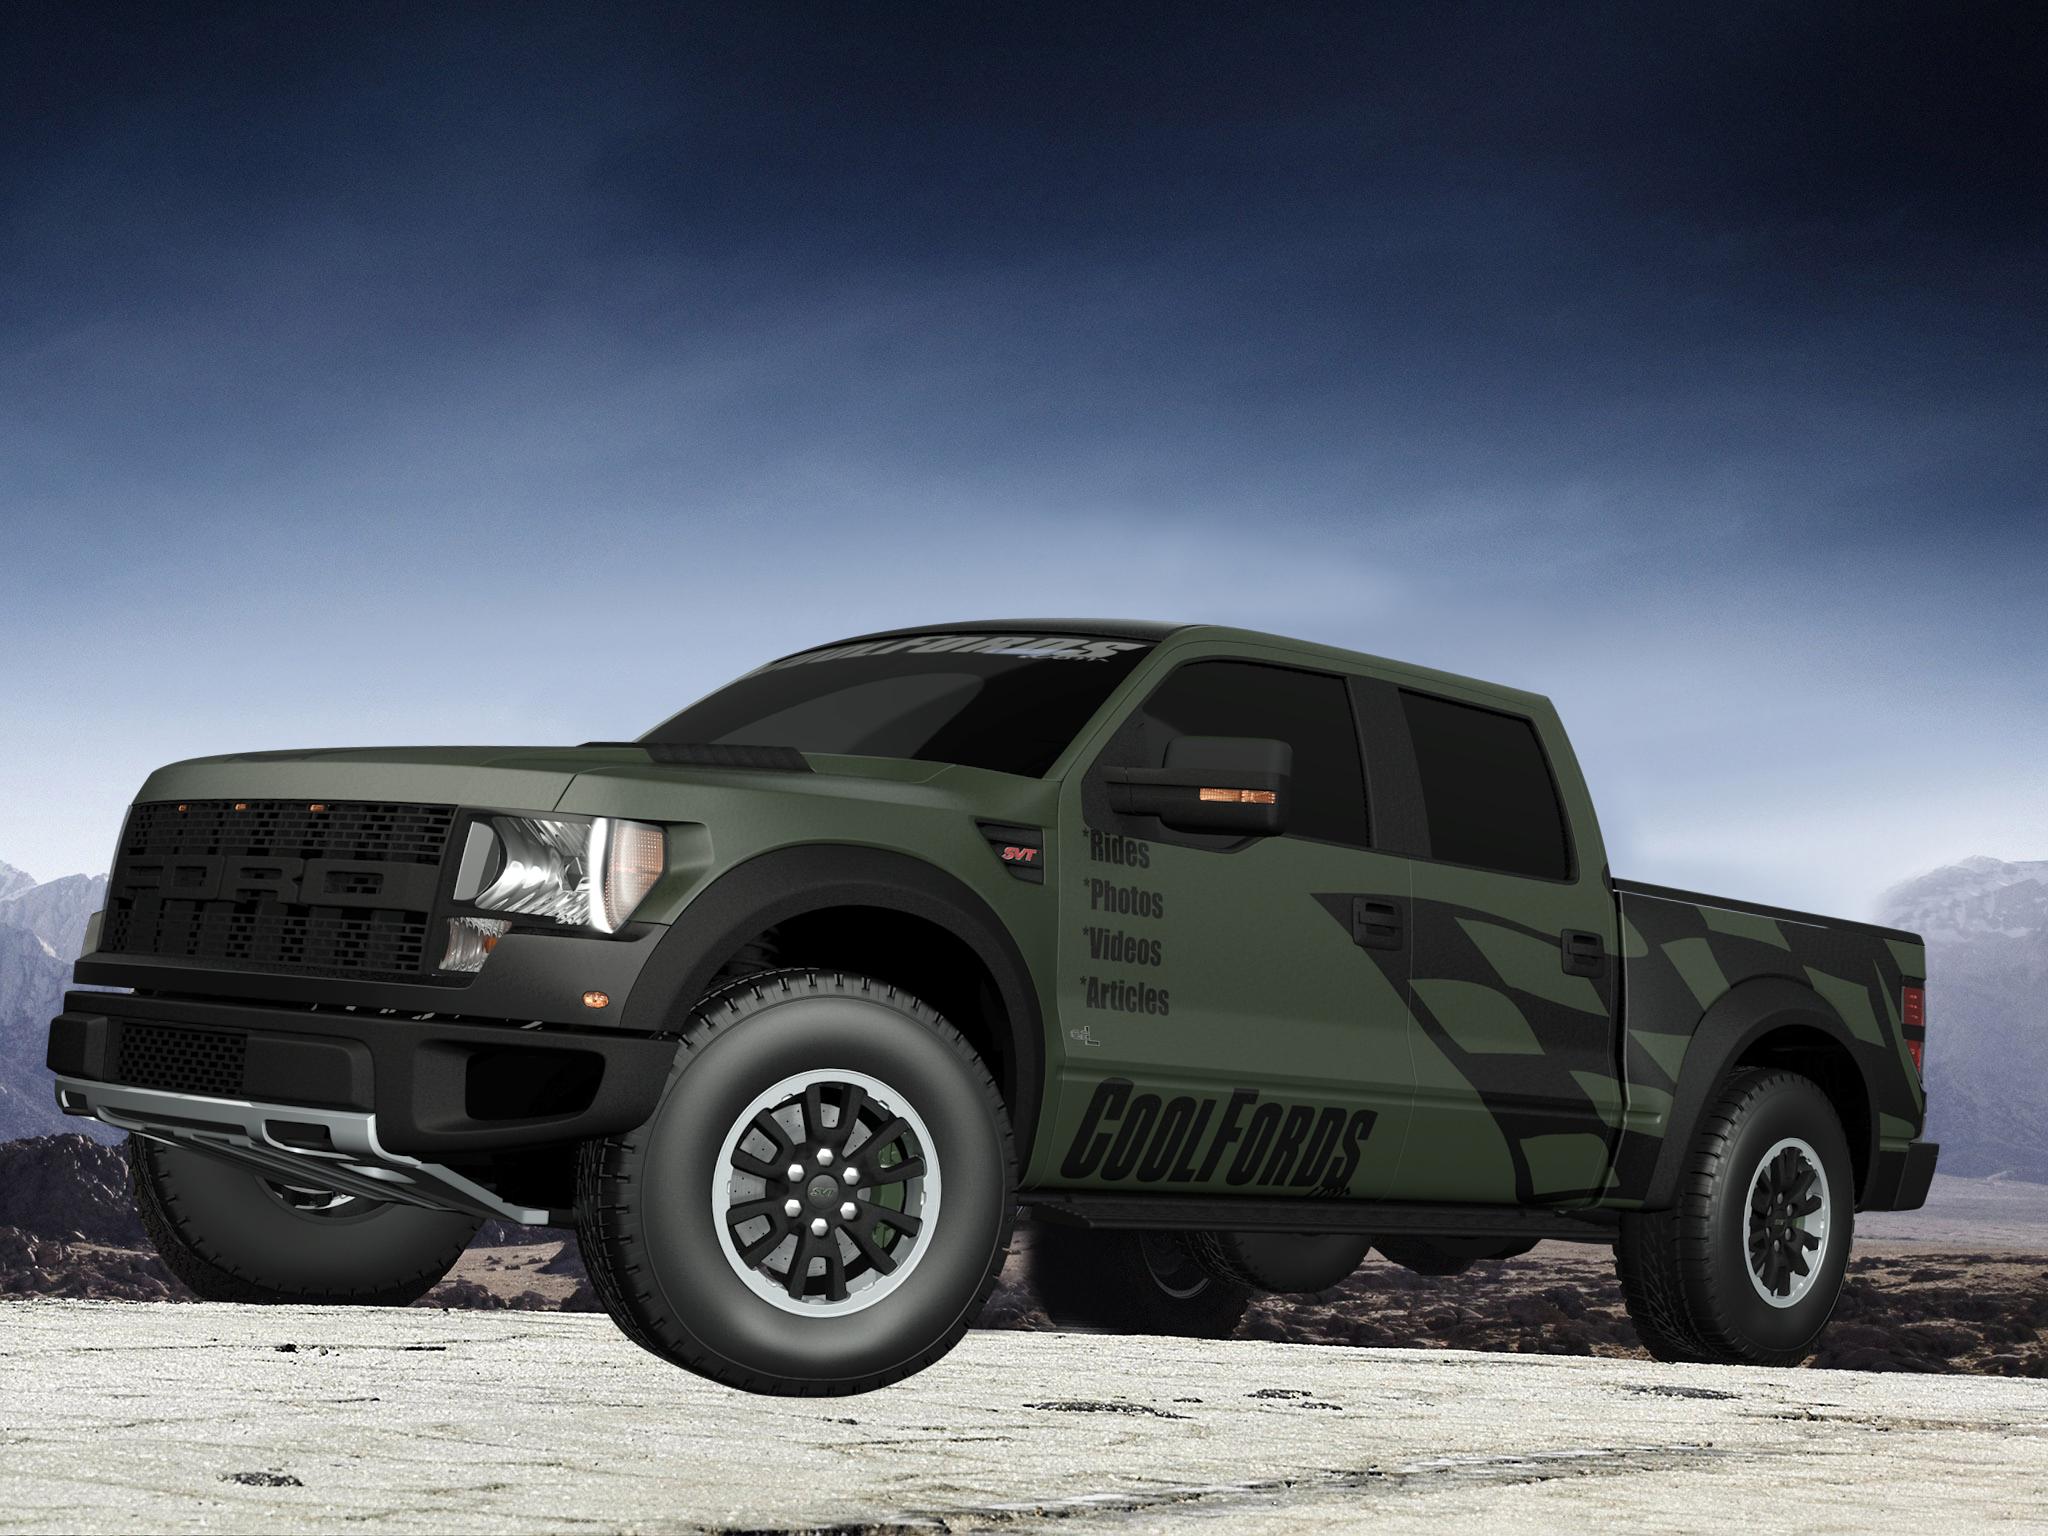 Coolfords Com Digitally Creates Army Green F 150 Svt